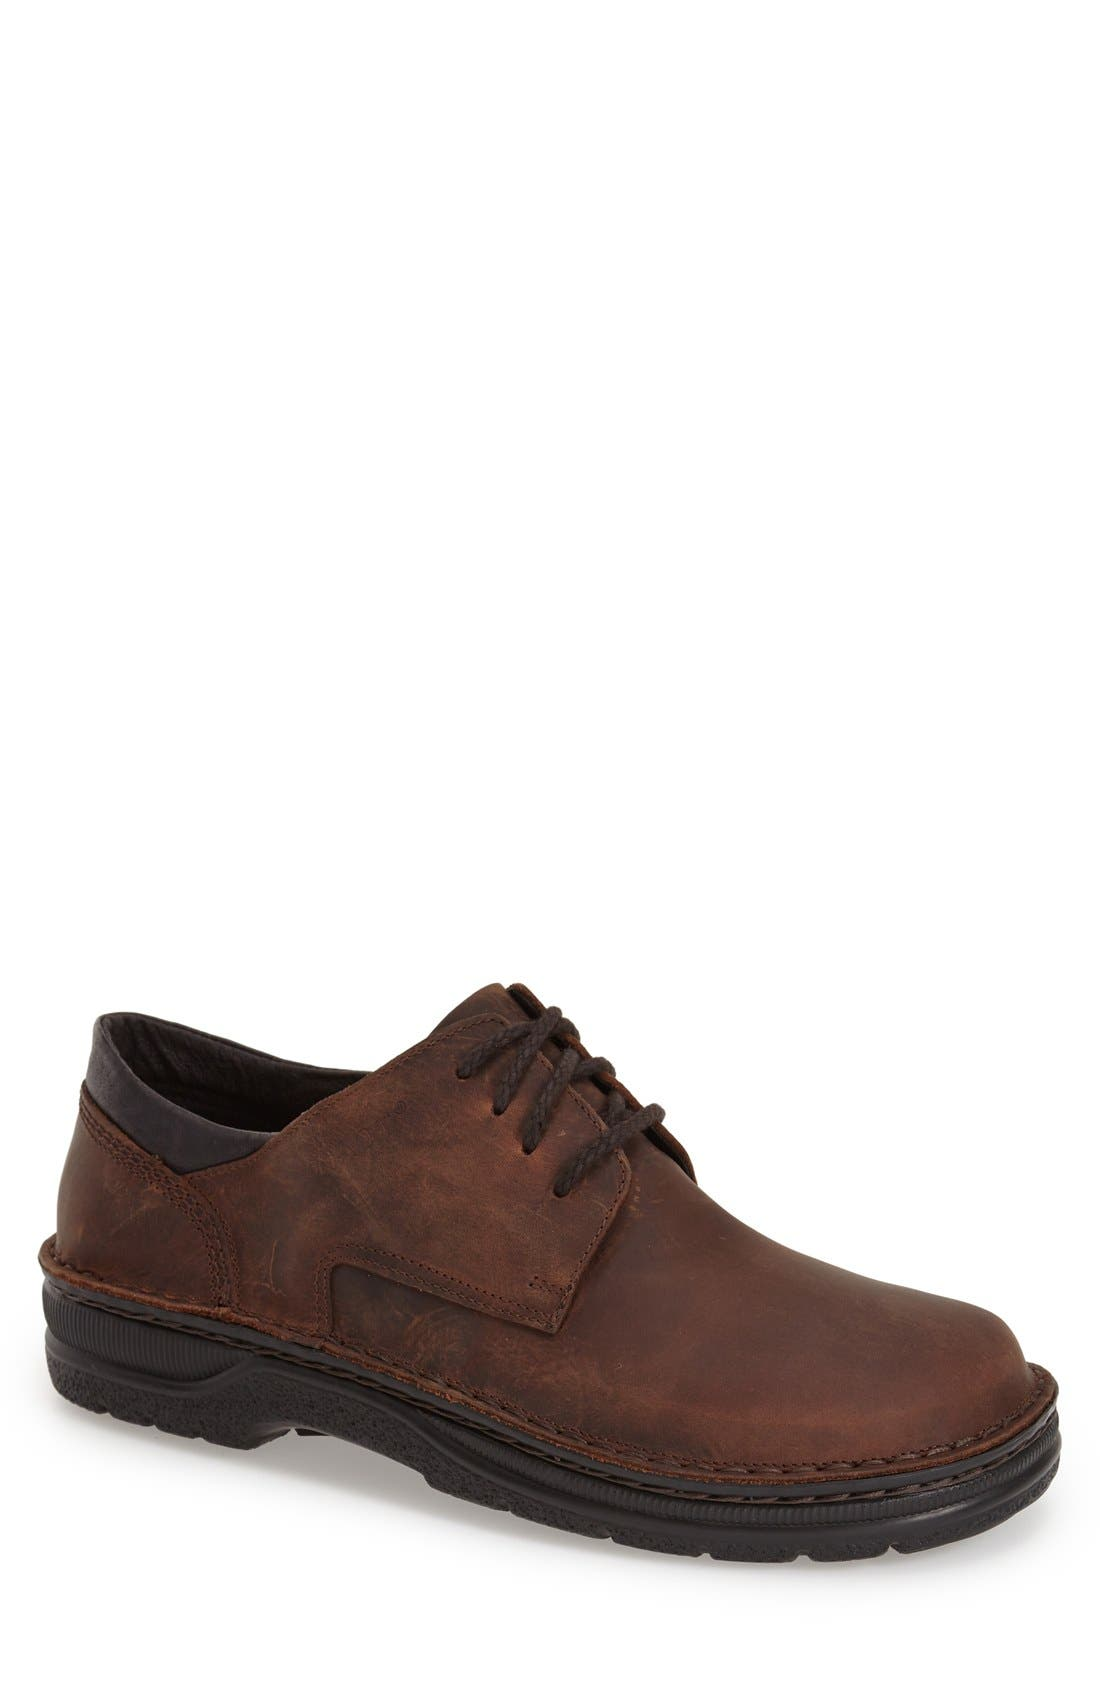 Denali Plain Toe Derby,                             Main thumbnail 1, color,                             Brown Leather